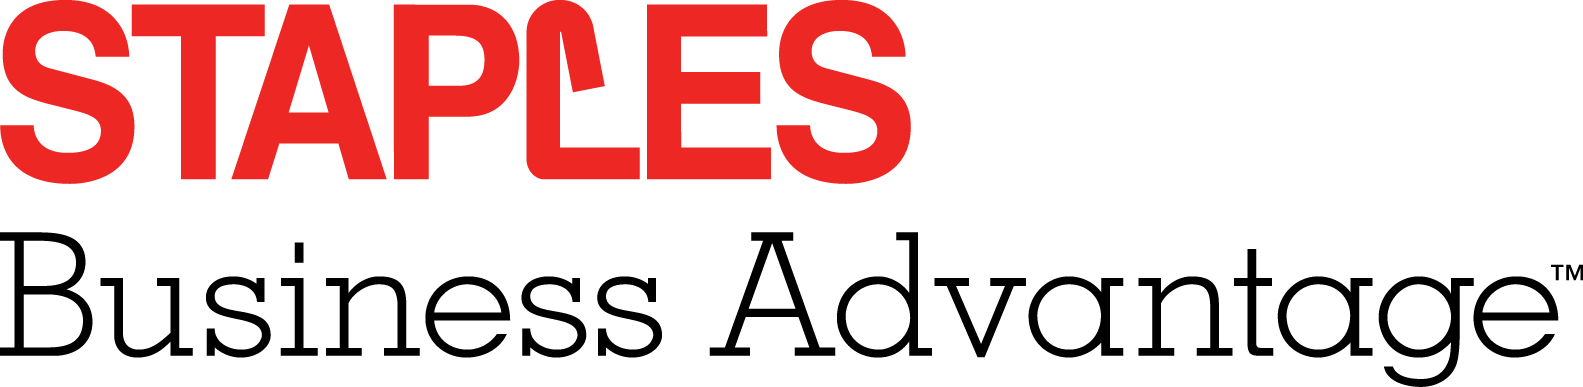 Staples Business Advantage - RMA - RMA